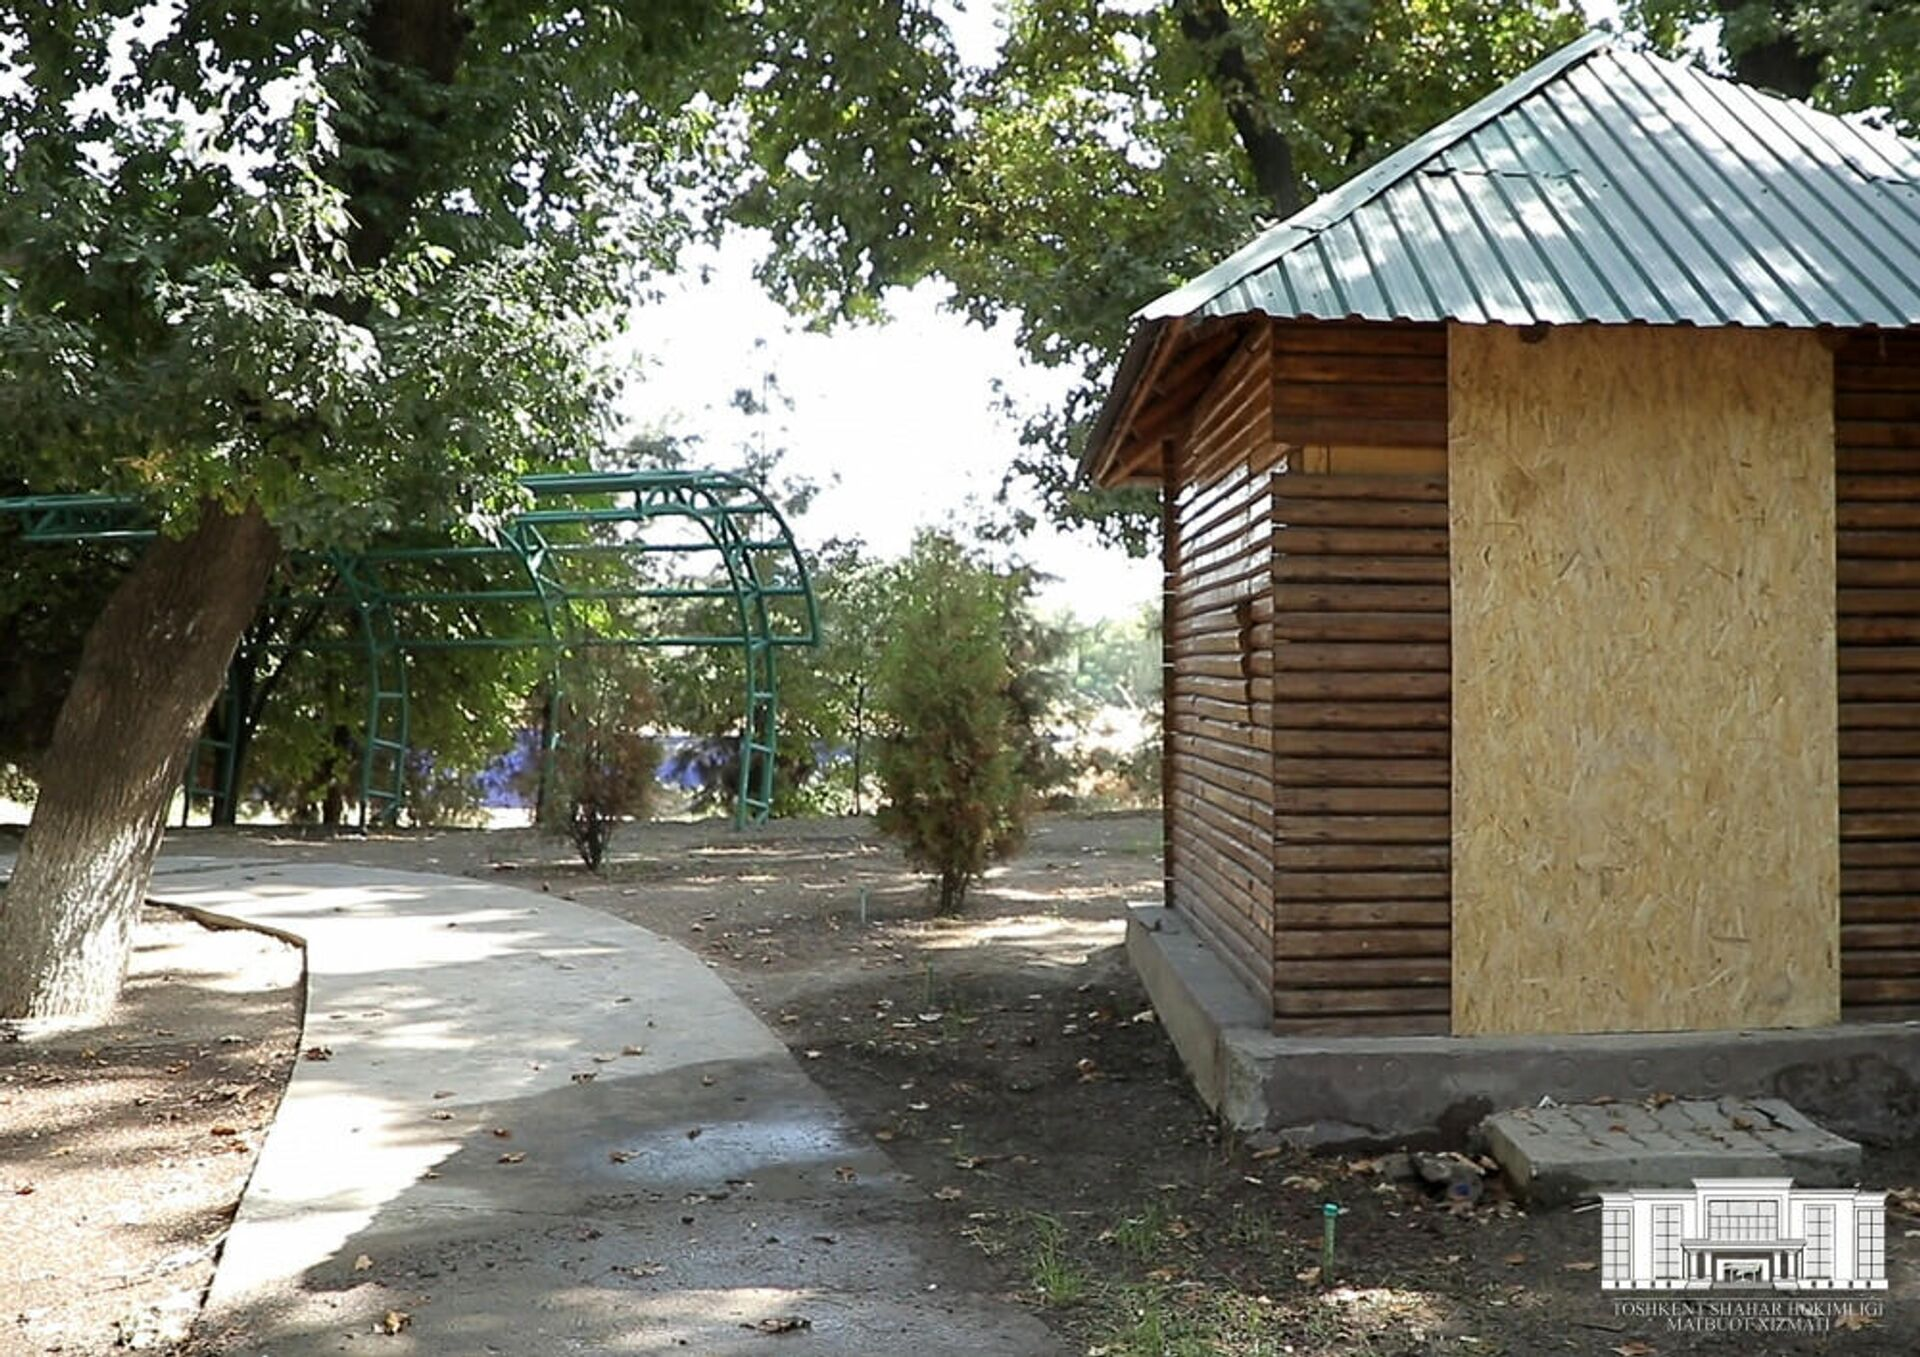 Реконструкция парка им. Абдуллы Кадыри - Sputnik Узбекистан, 1920, 11.09.2021